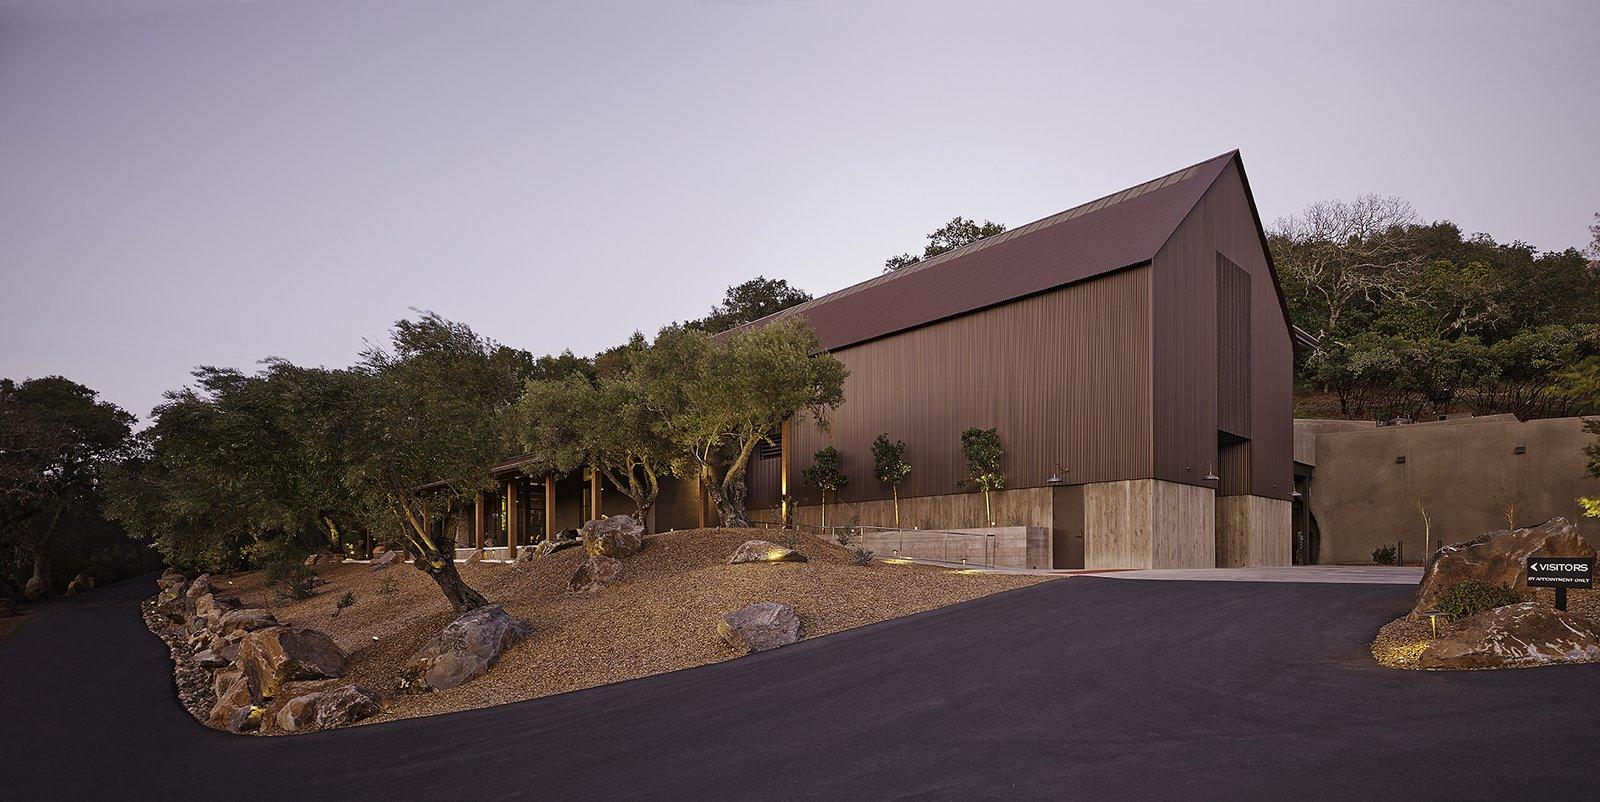 BRAND winery exterior